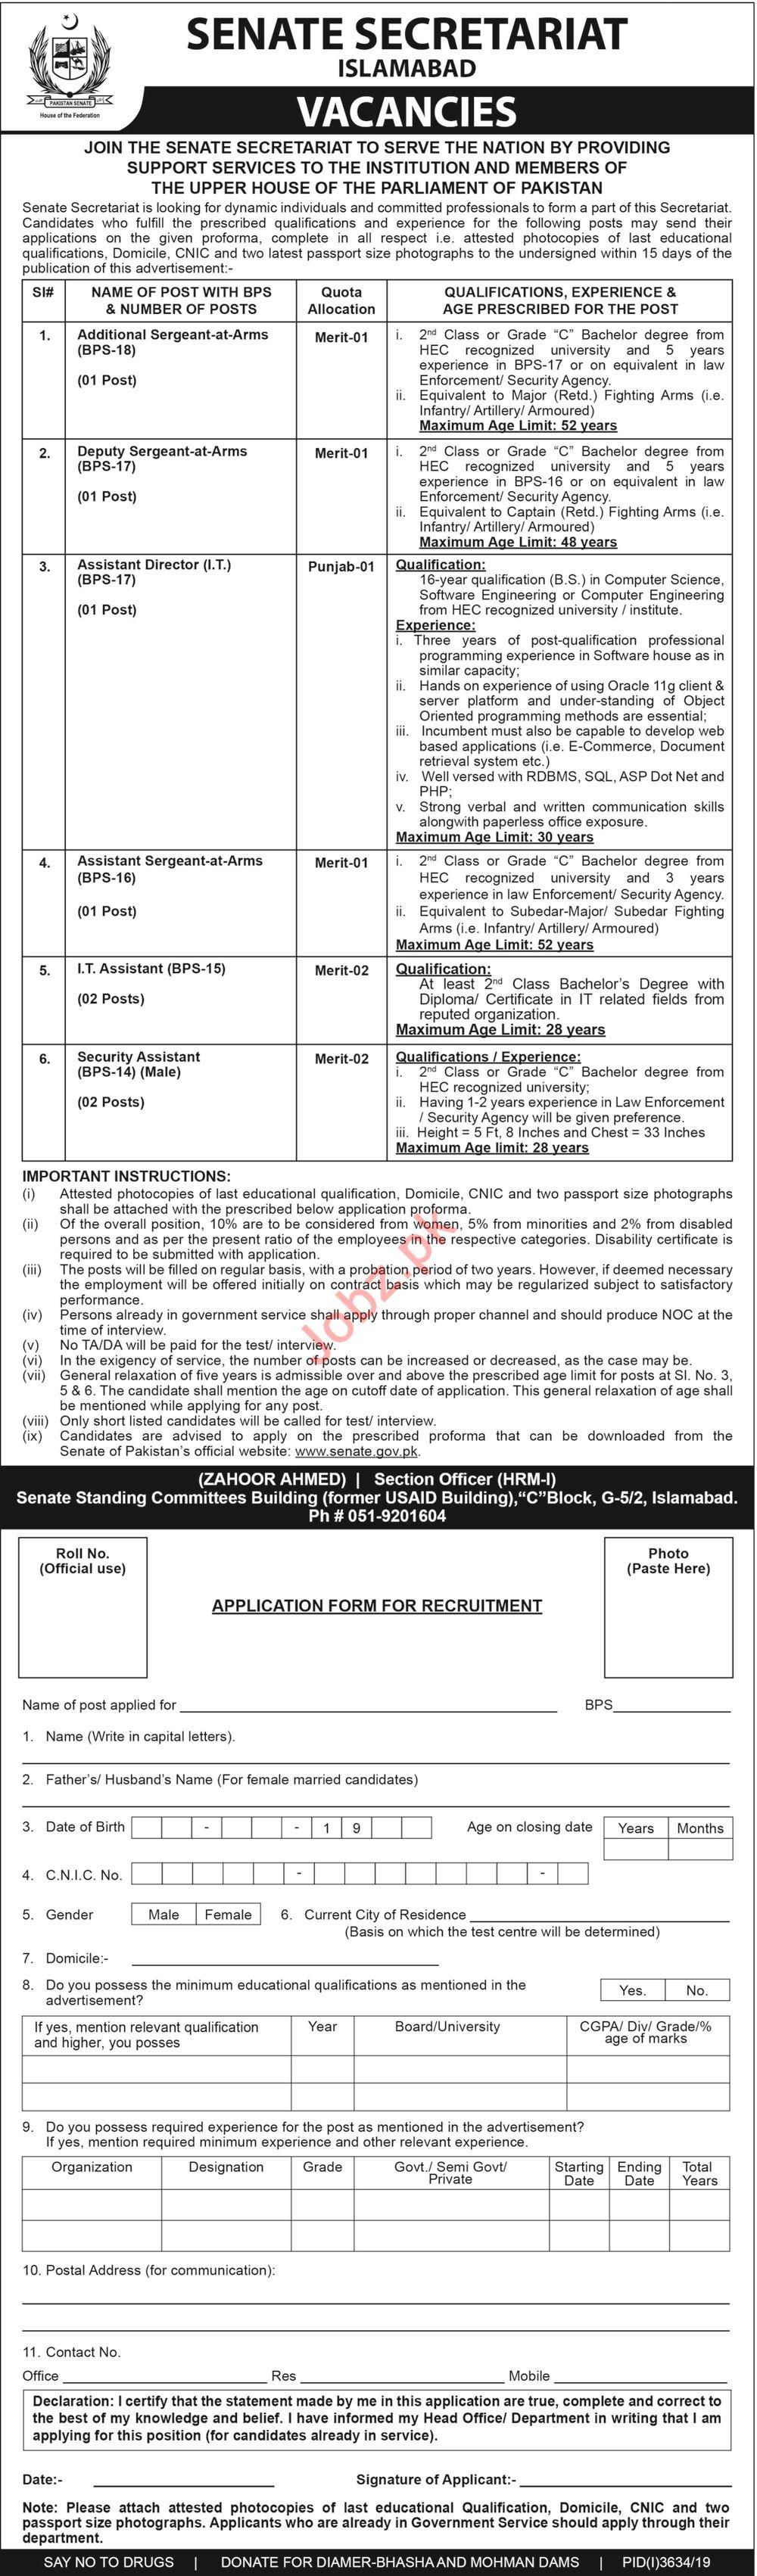 Senate Secretariat Jobs 2020 in Islamabad